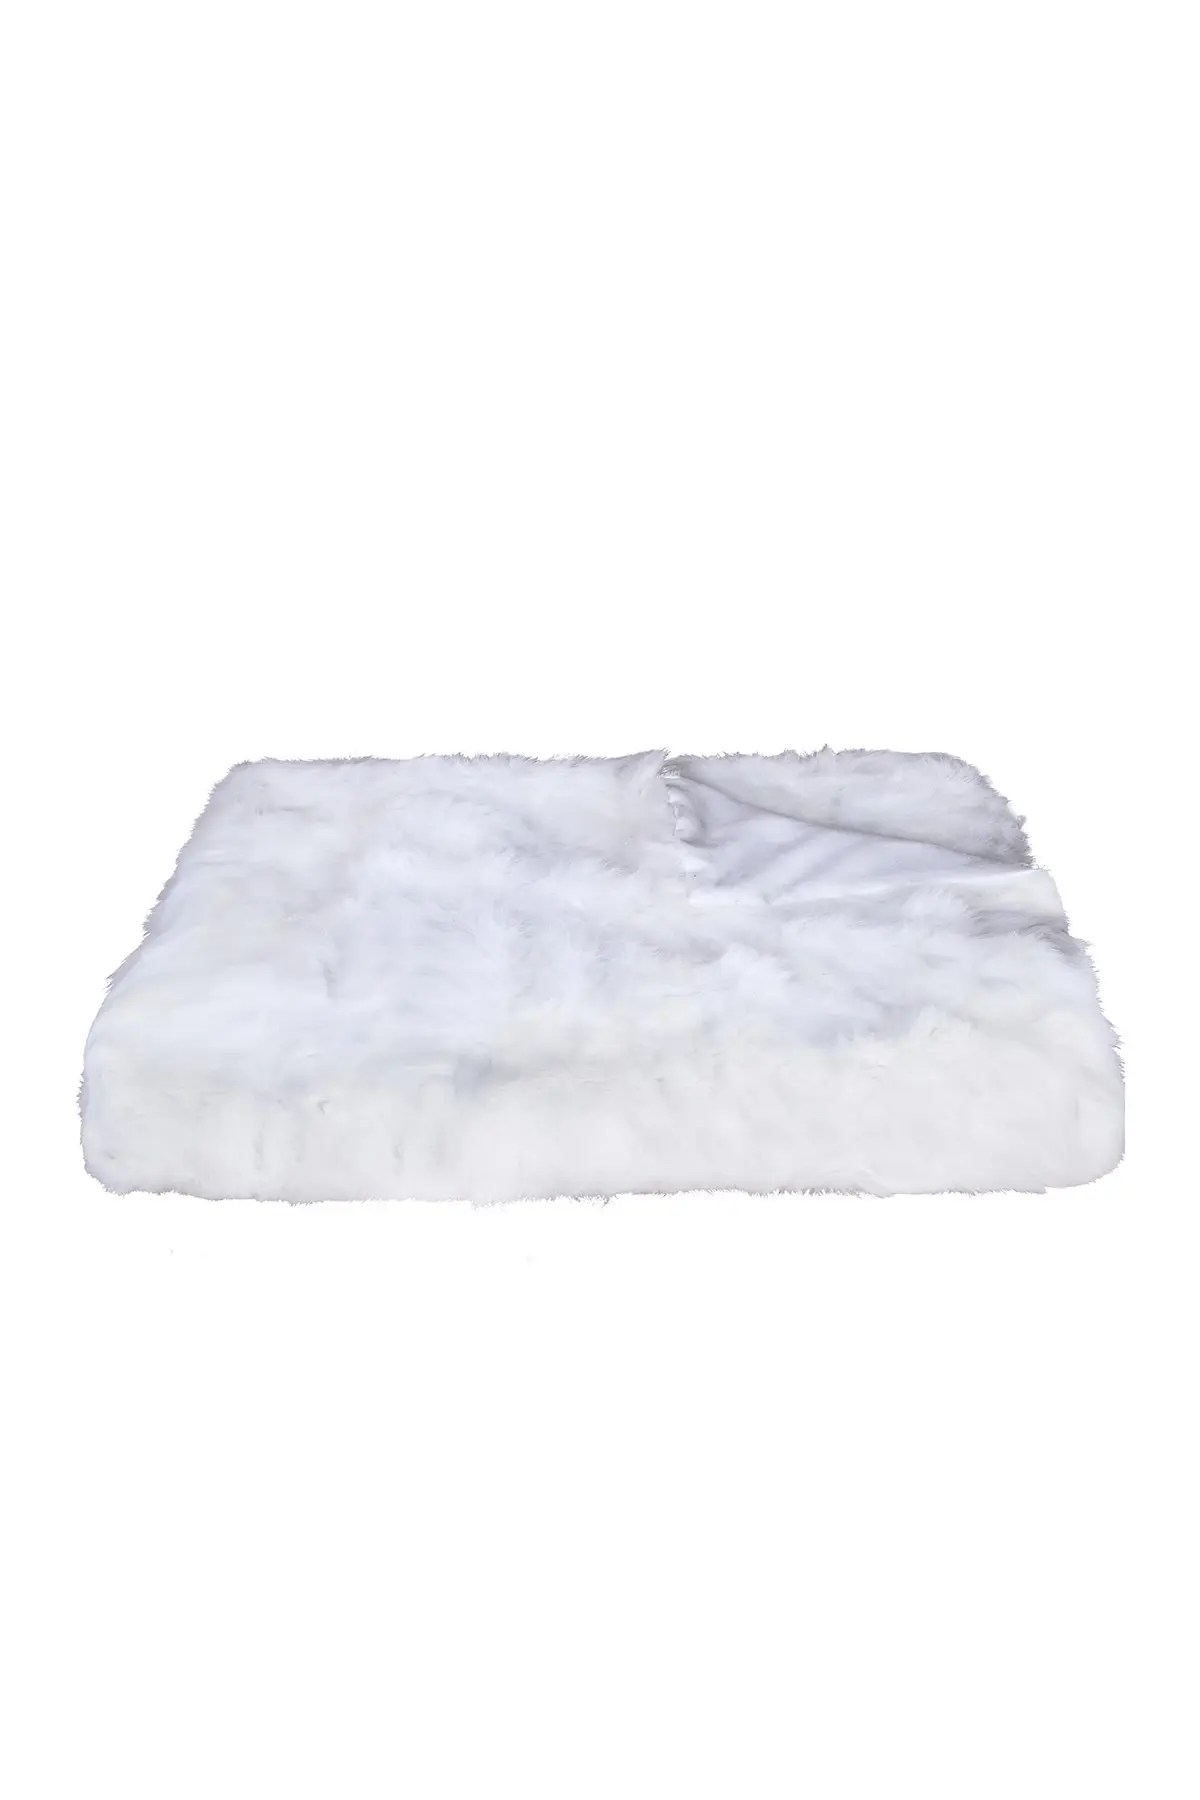 natural genuine rabbit fur throw blanket 50 x 60 white nordstrom rack